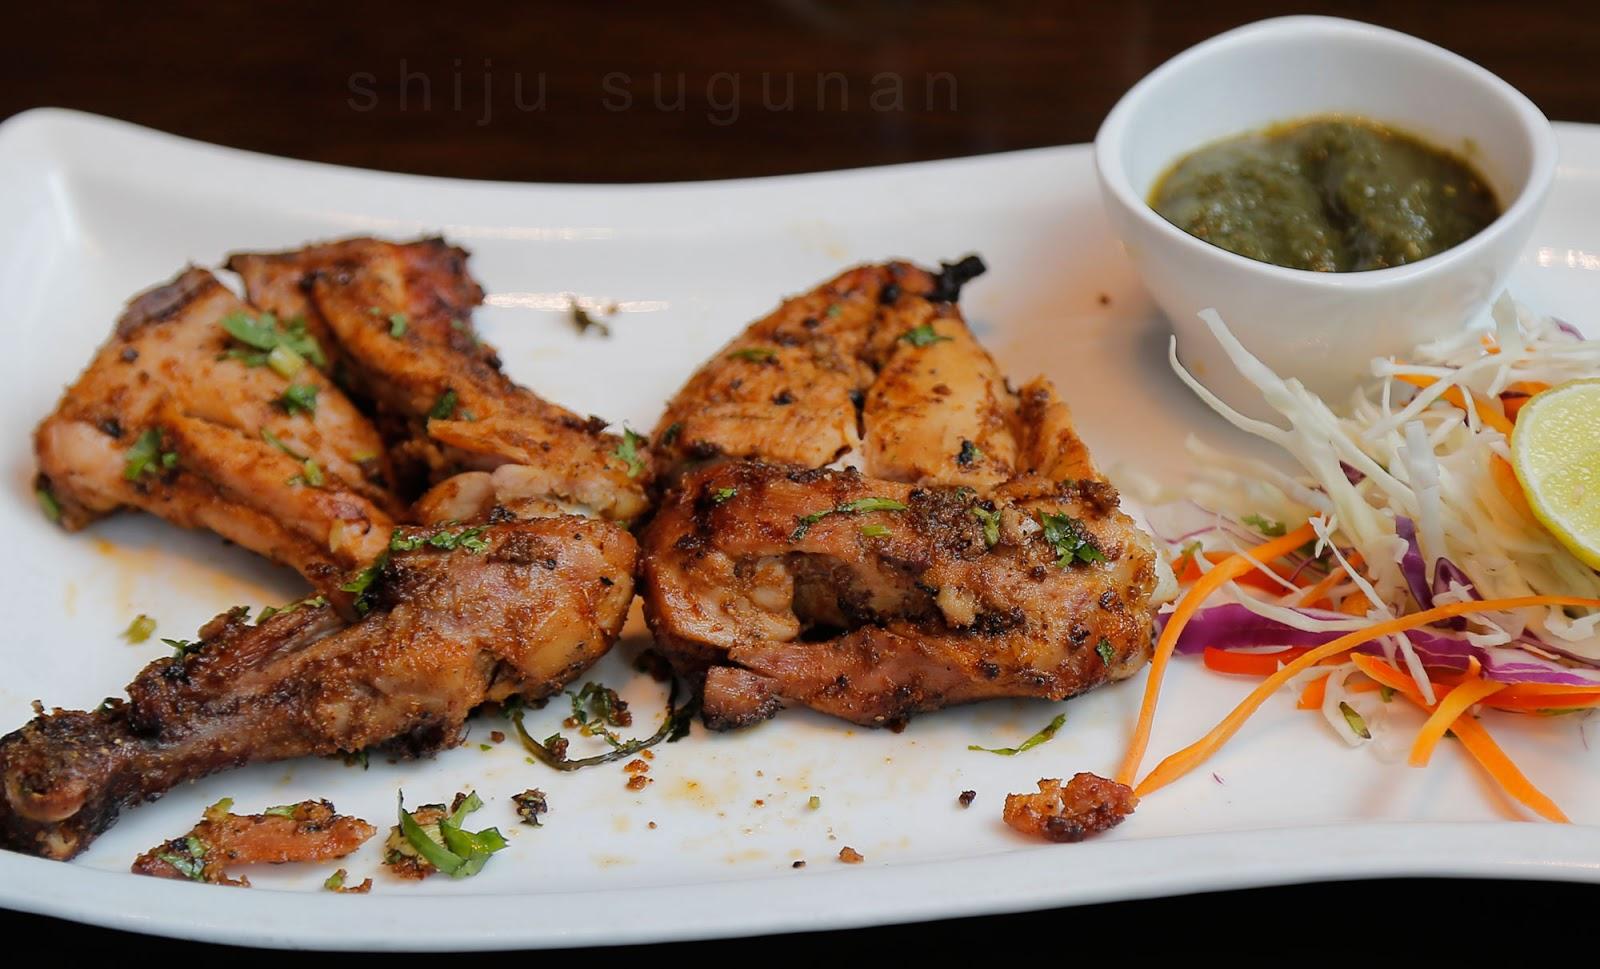 Cranium bolts amritsari food festival at aloft bangalore for Amritsari cuisine